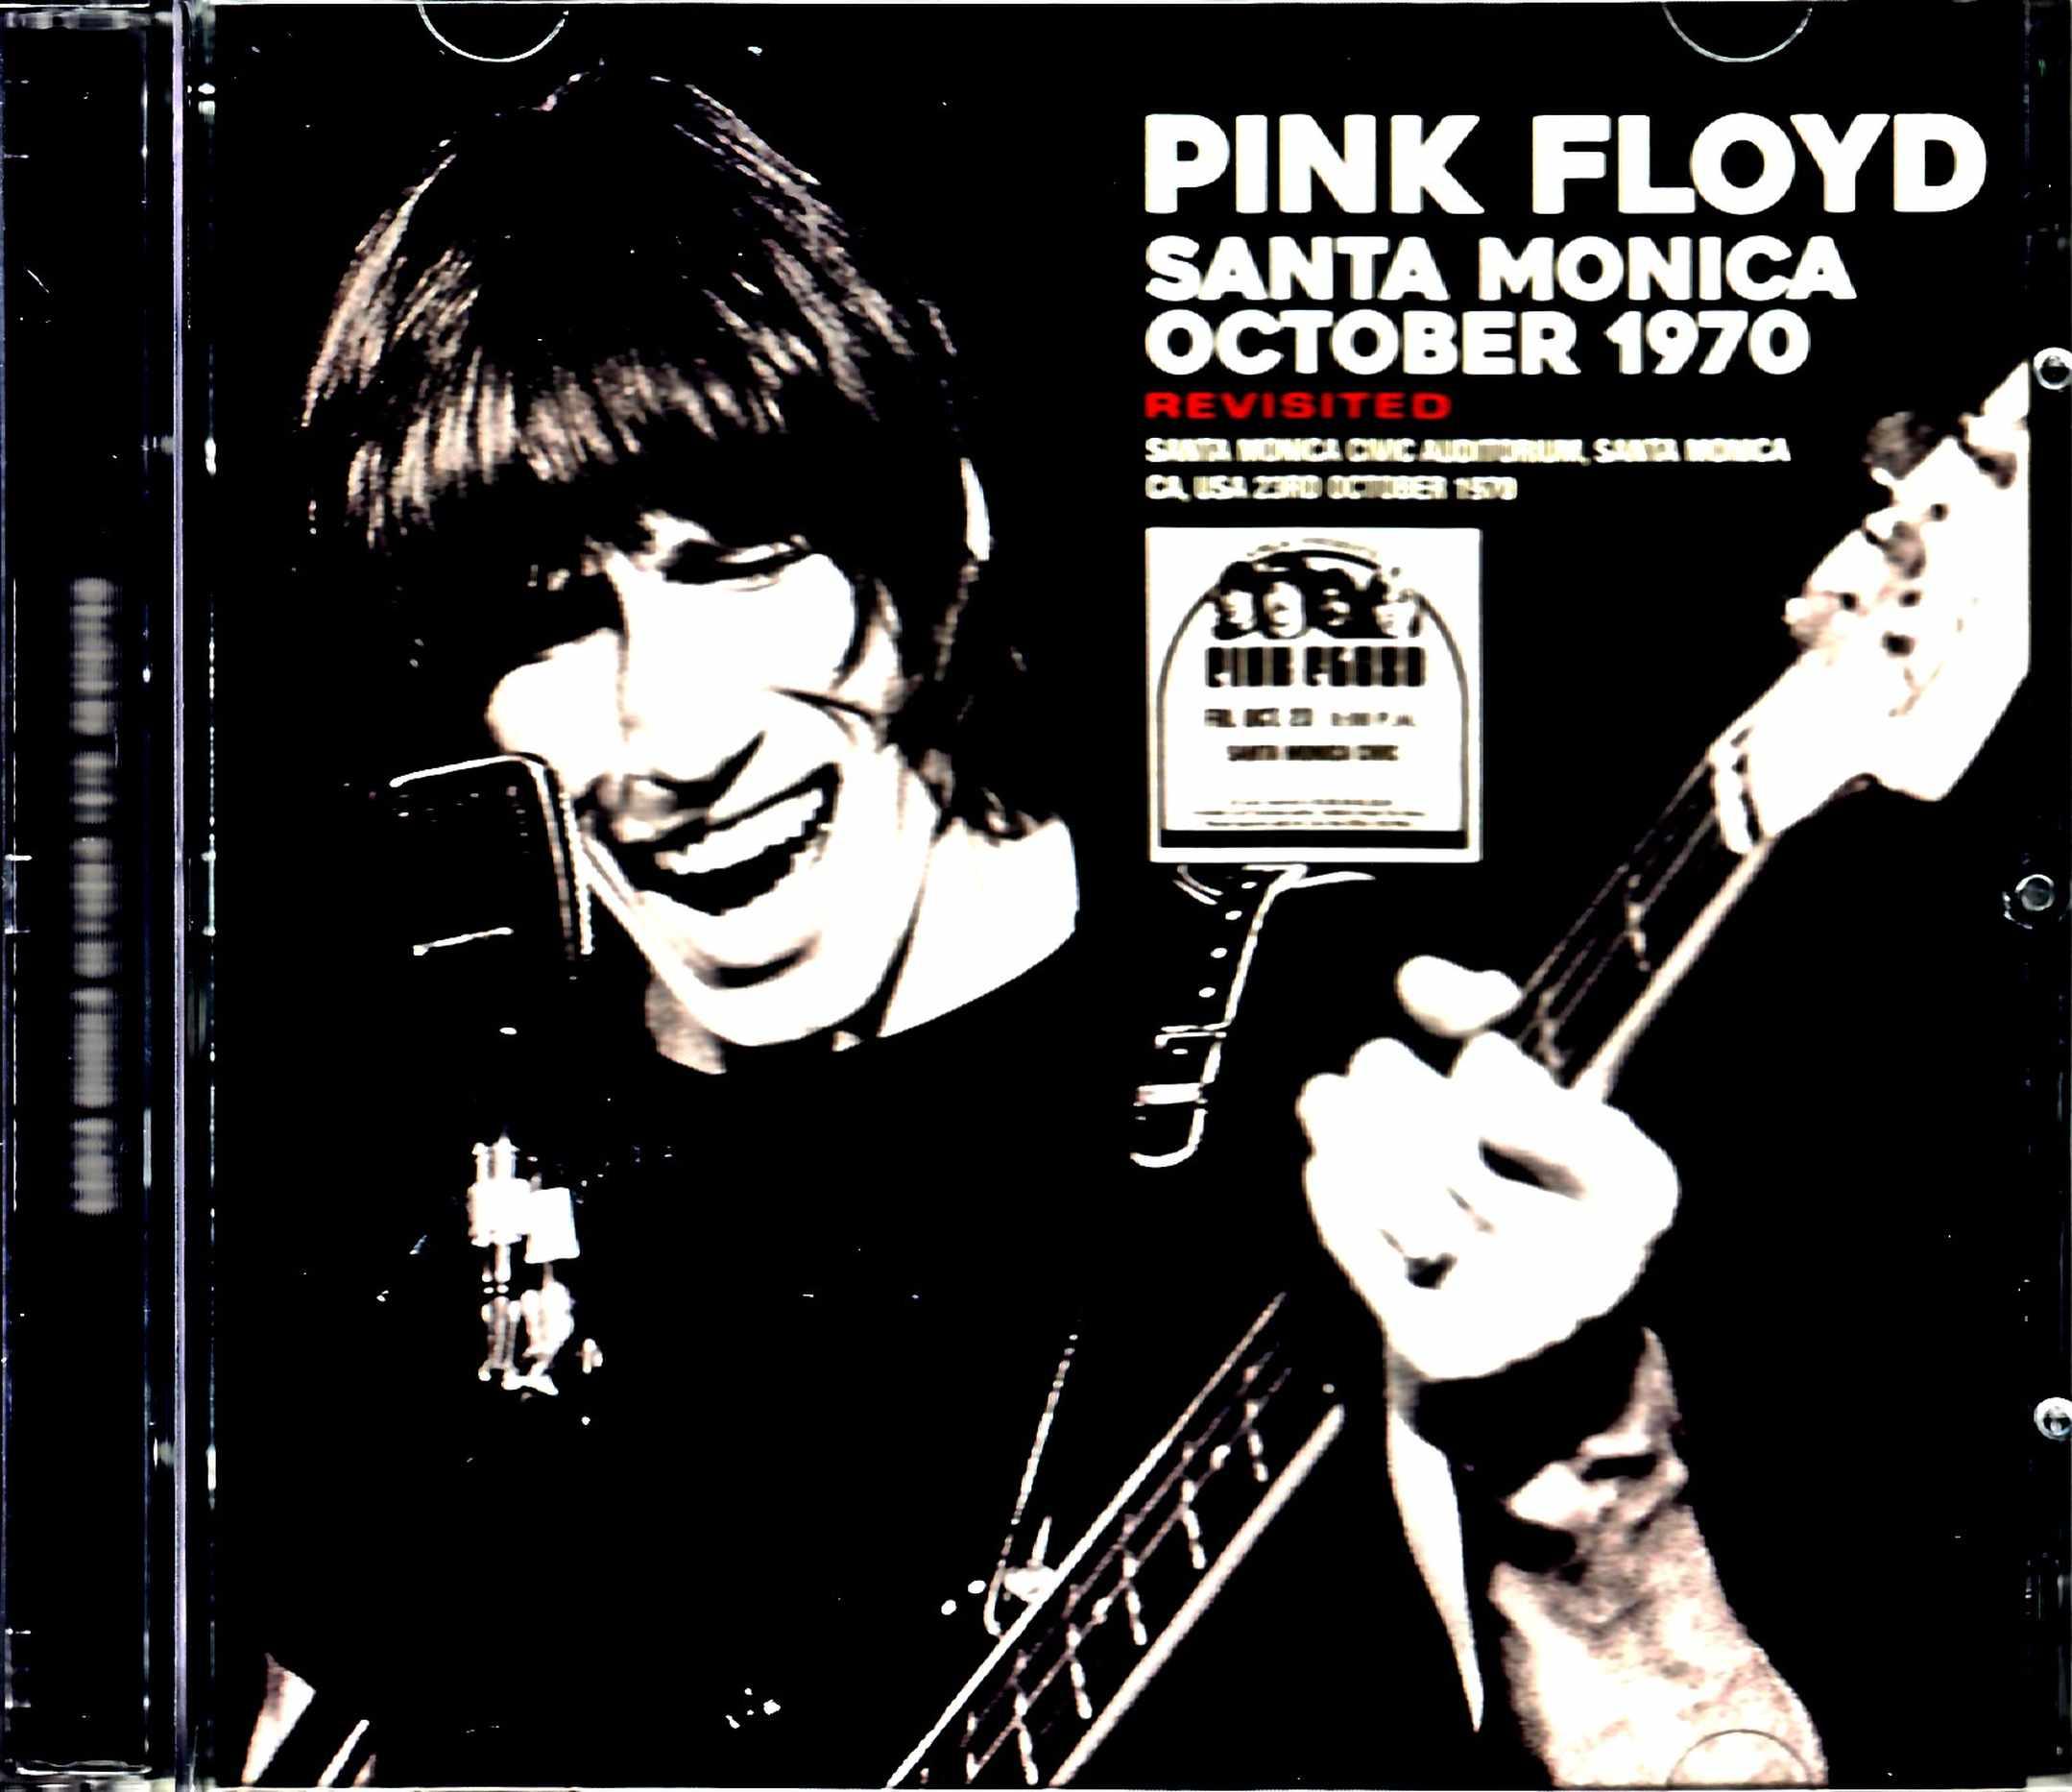 Pink Floyd ピンク・フロイド/CA,USA 10.23.1970 Upgrade